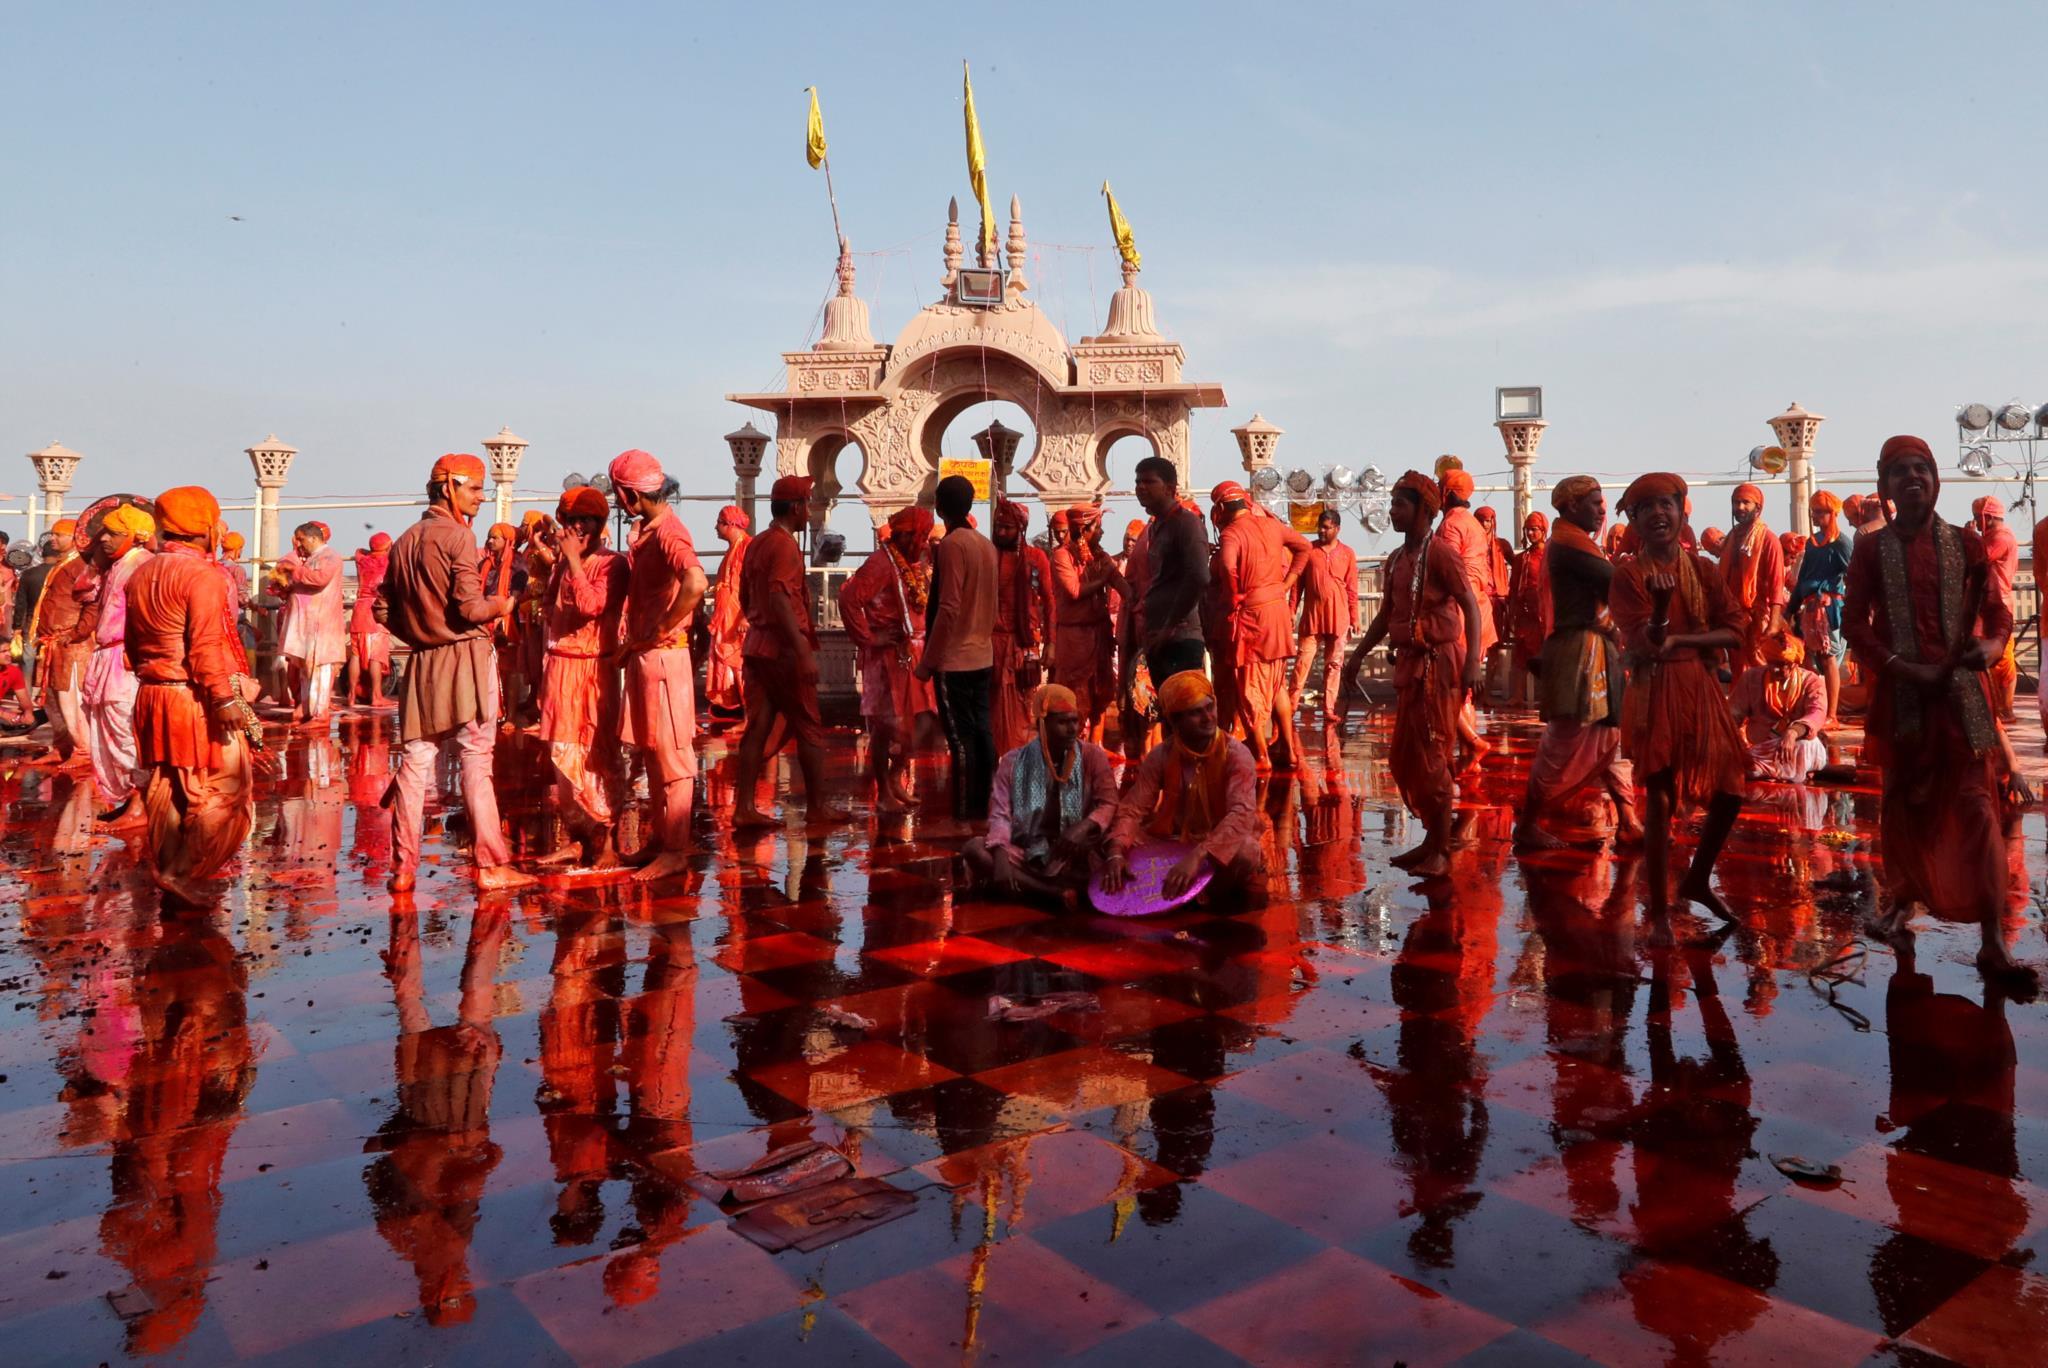 O Festival das Cores num templo na cidade de Barsana, no estado de Uttar Pradesh (Índia)